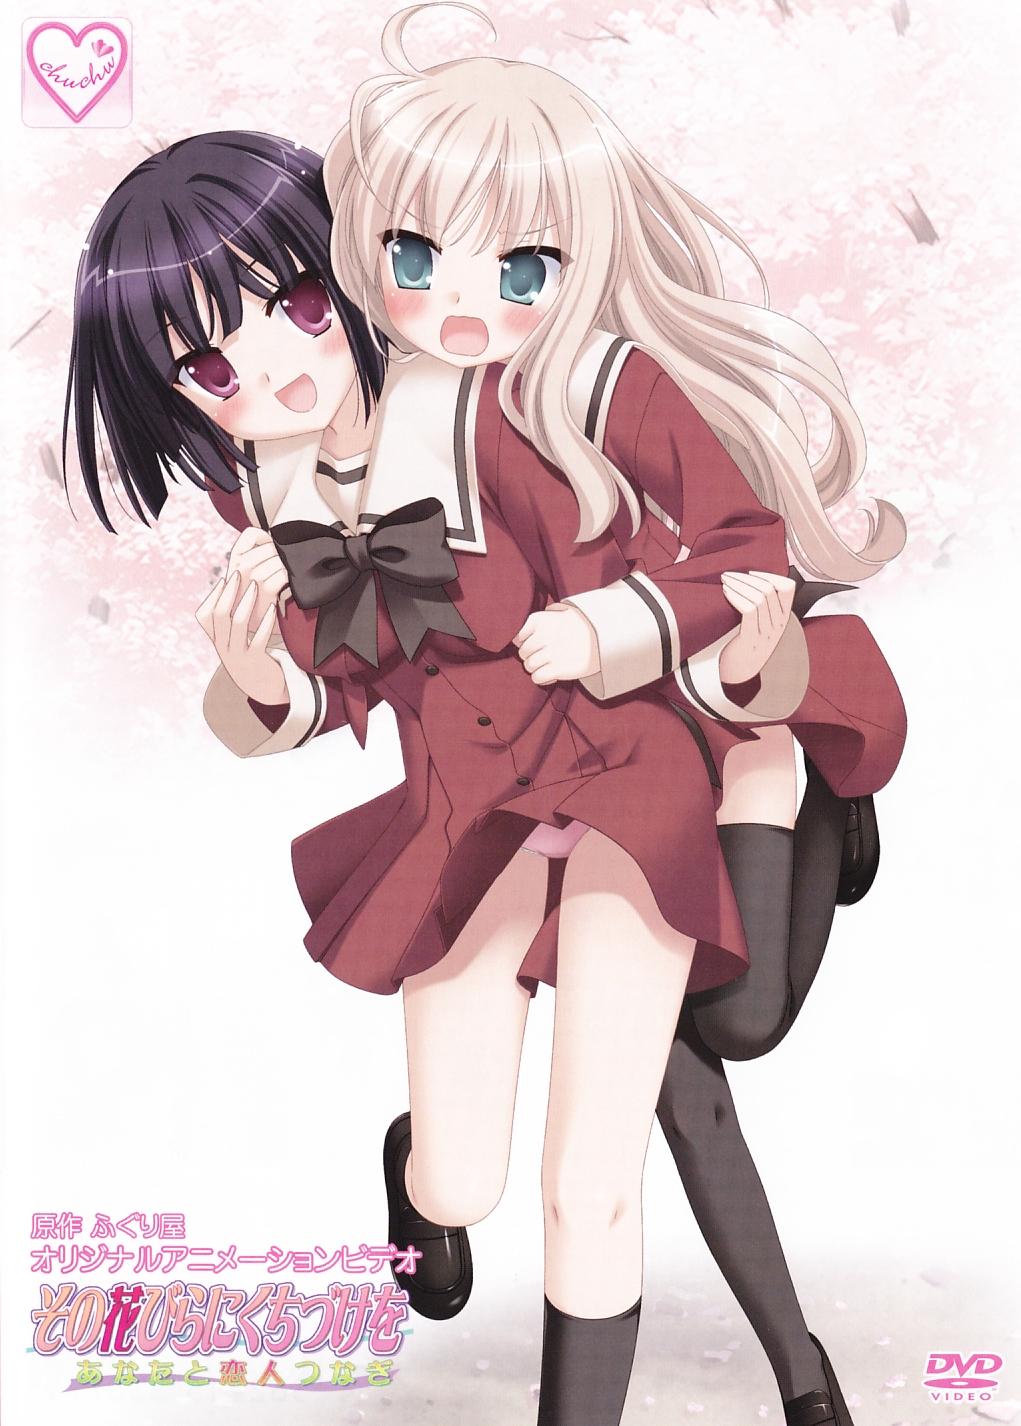 animes yuri y yahoi